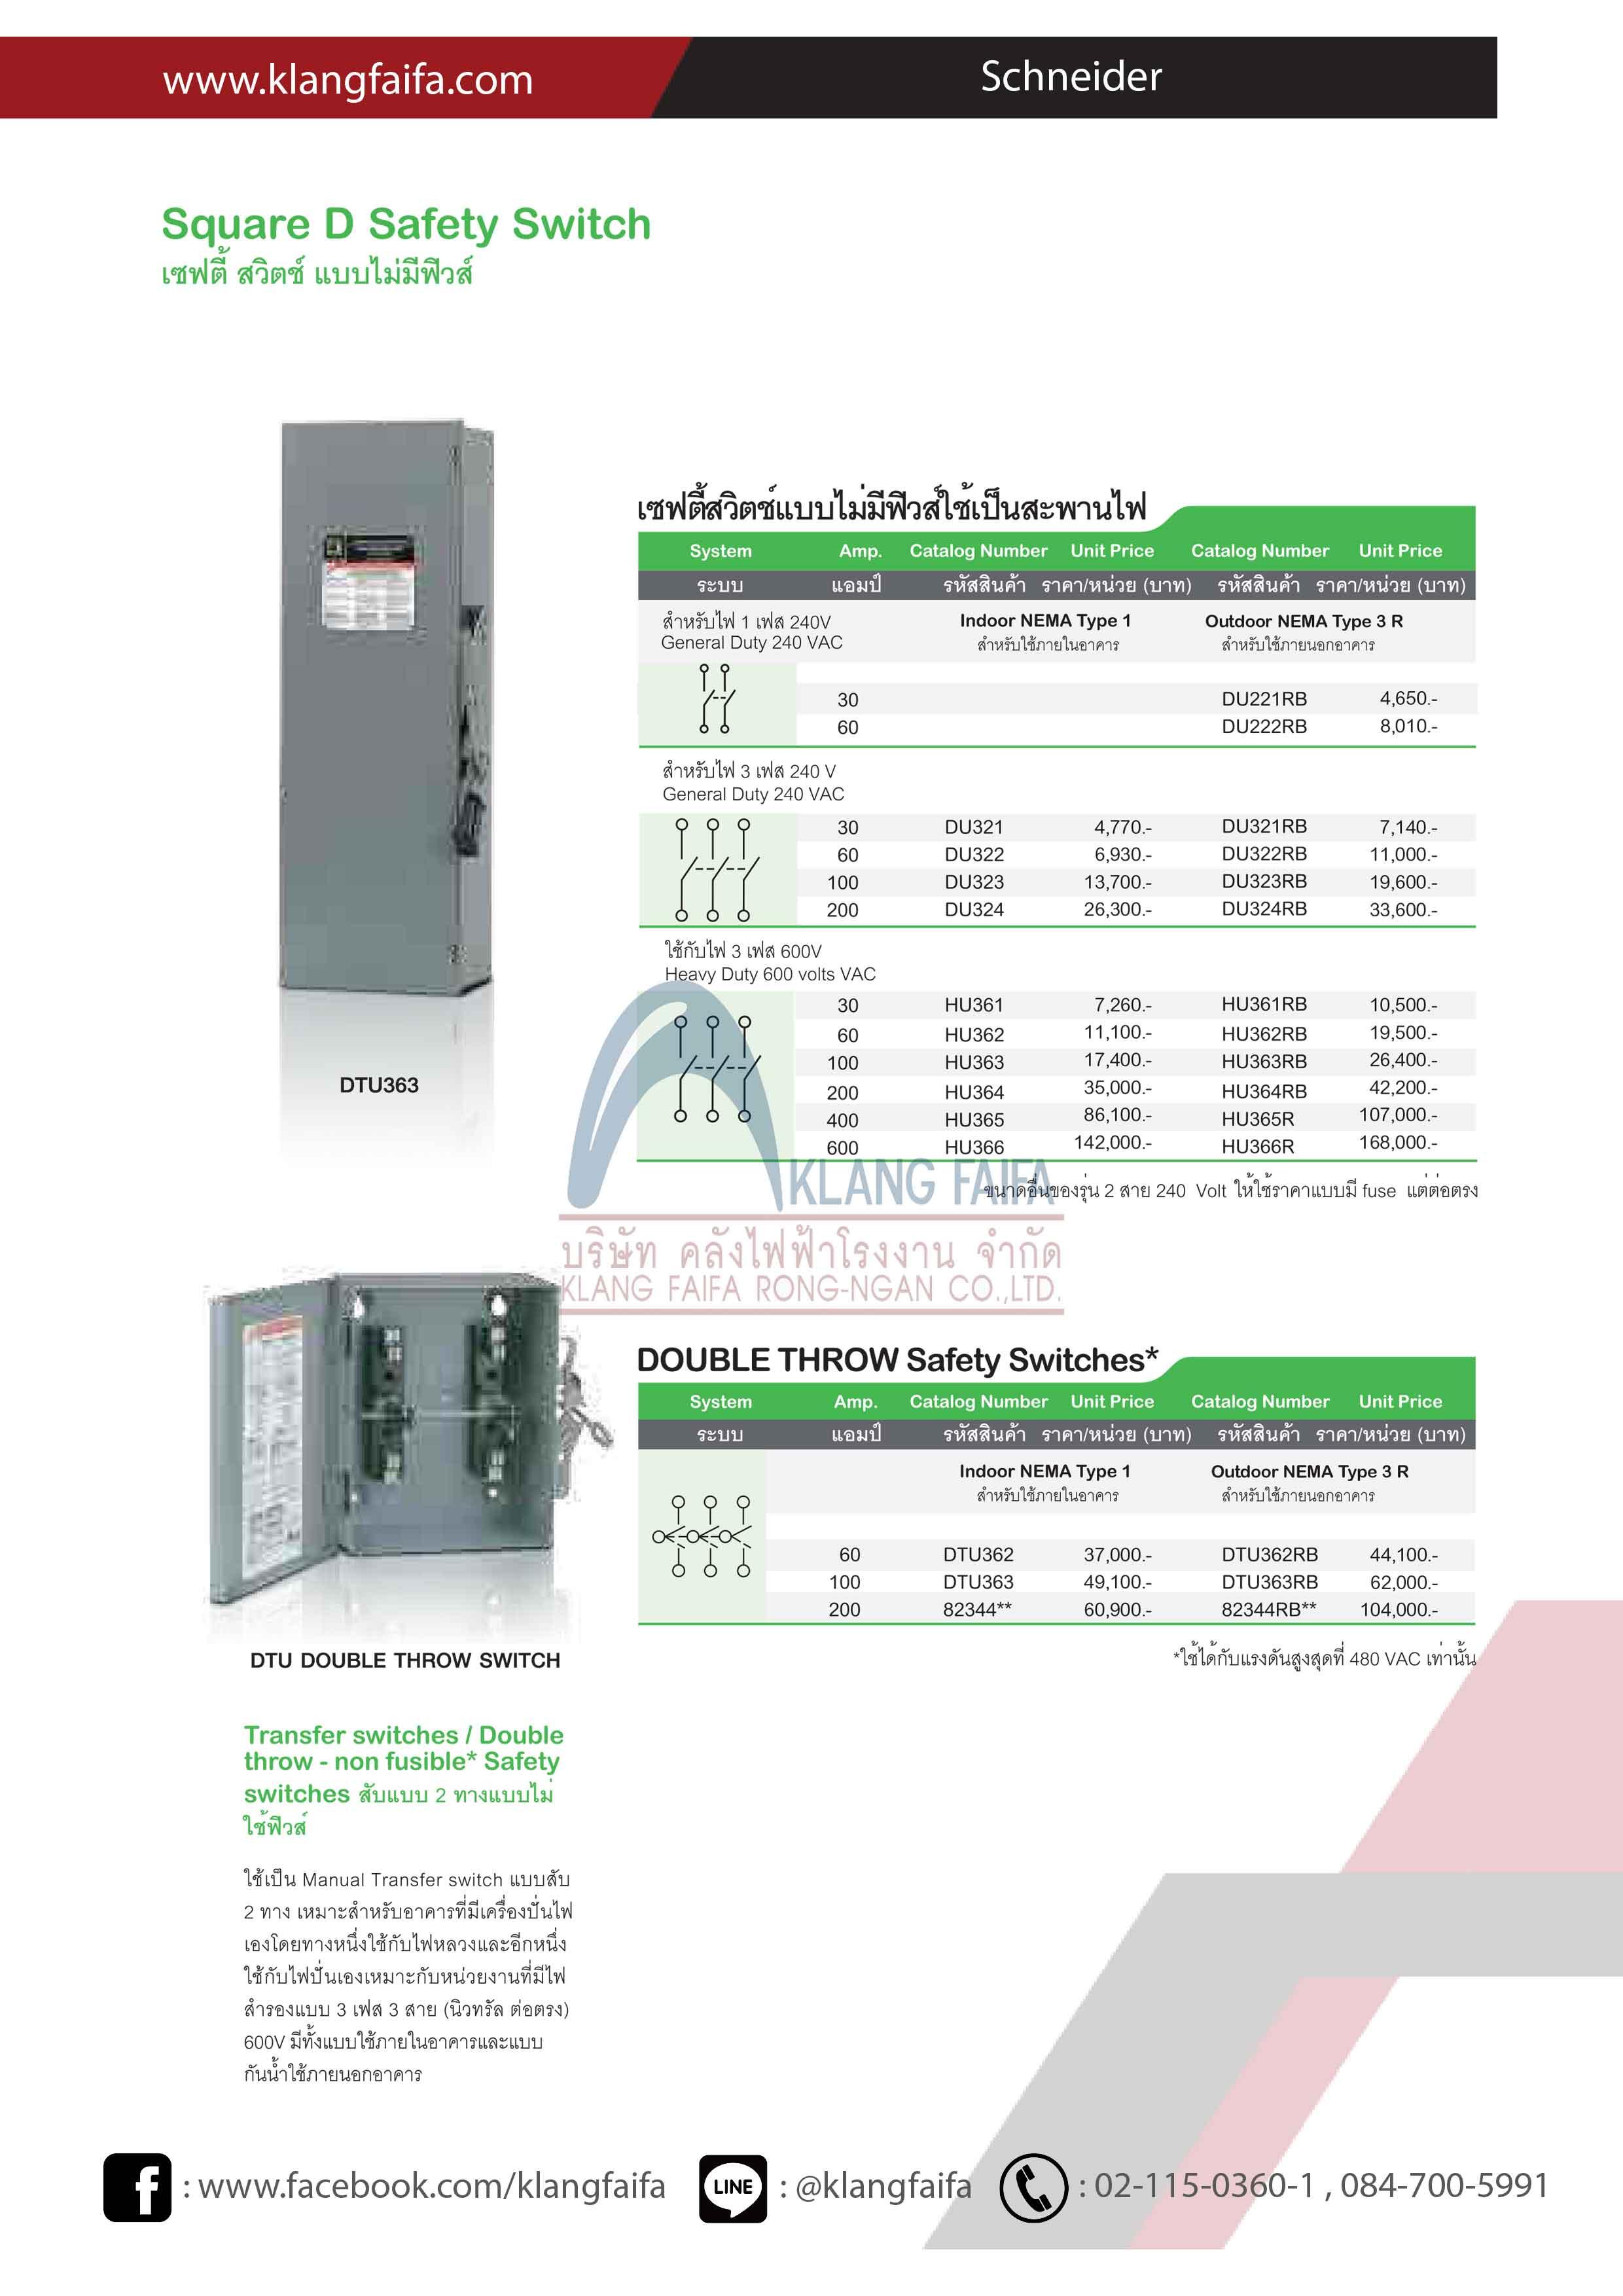 Schneider, ชไนเดอร์, Schneider2019, Square-D-Safety-Switch, แบบติดตั้งฟิวส์ได้